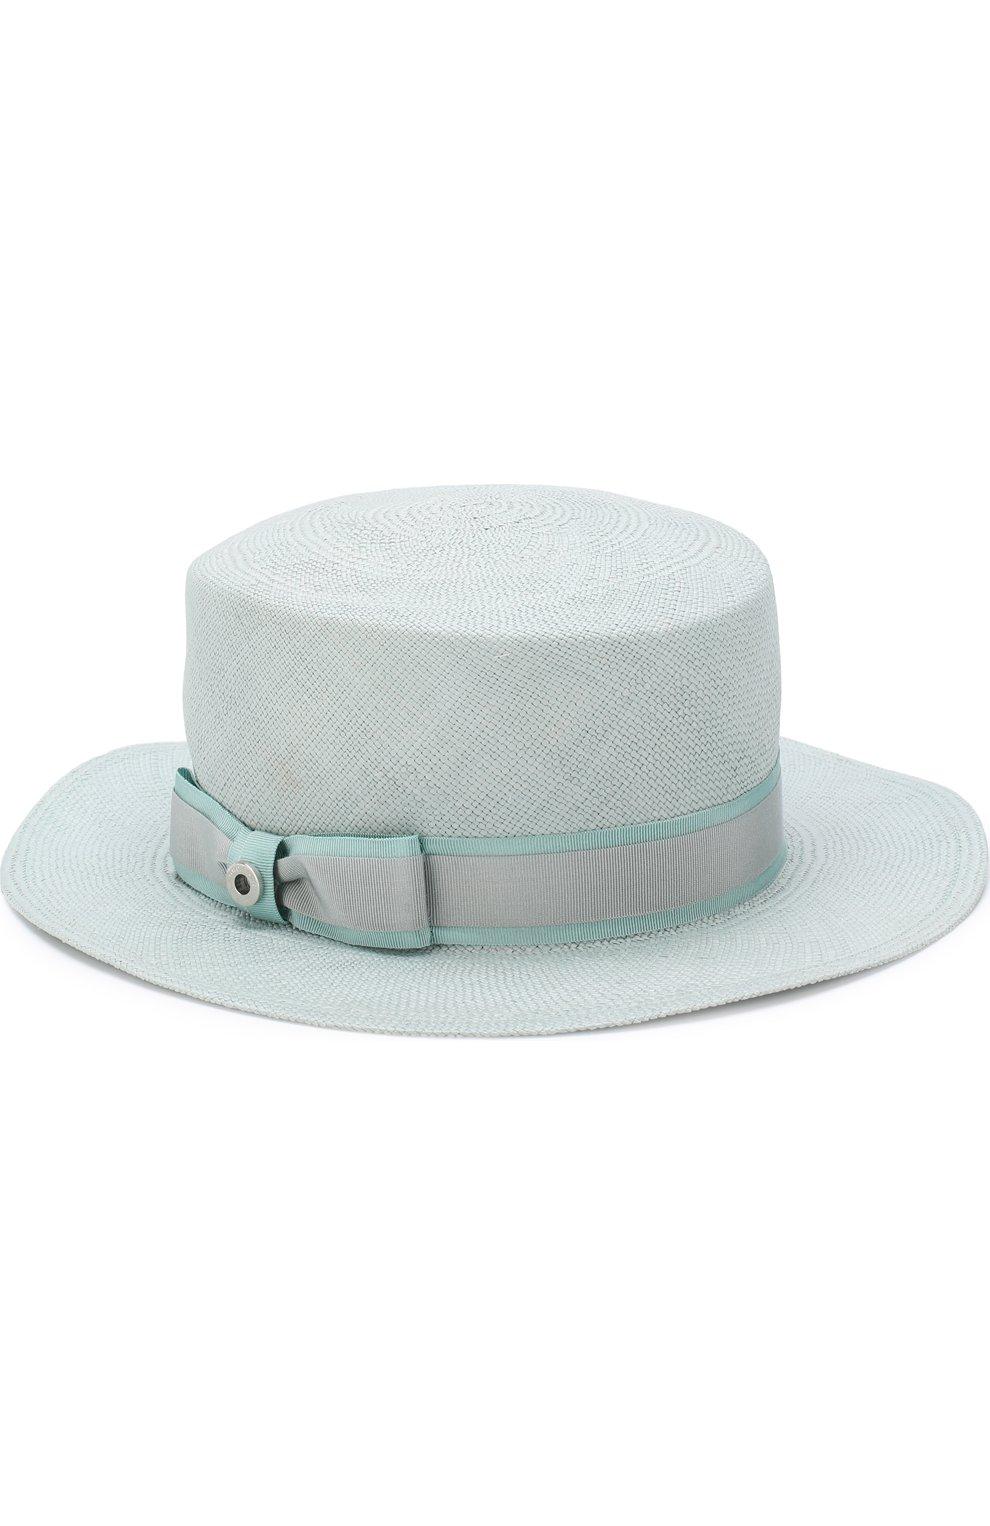 Соломенная шляпа Venezia | Фото №1